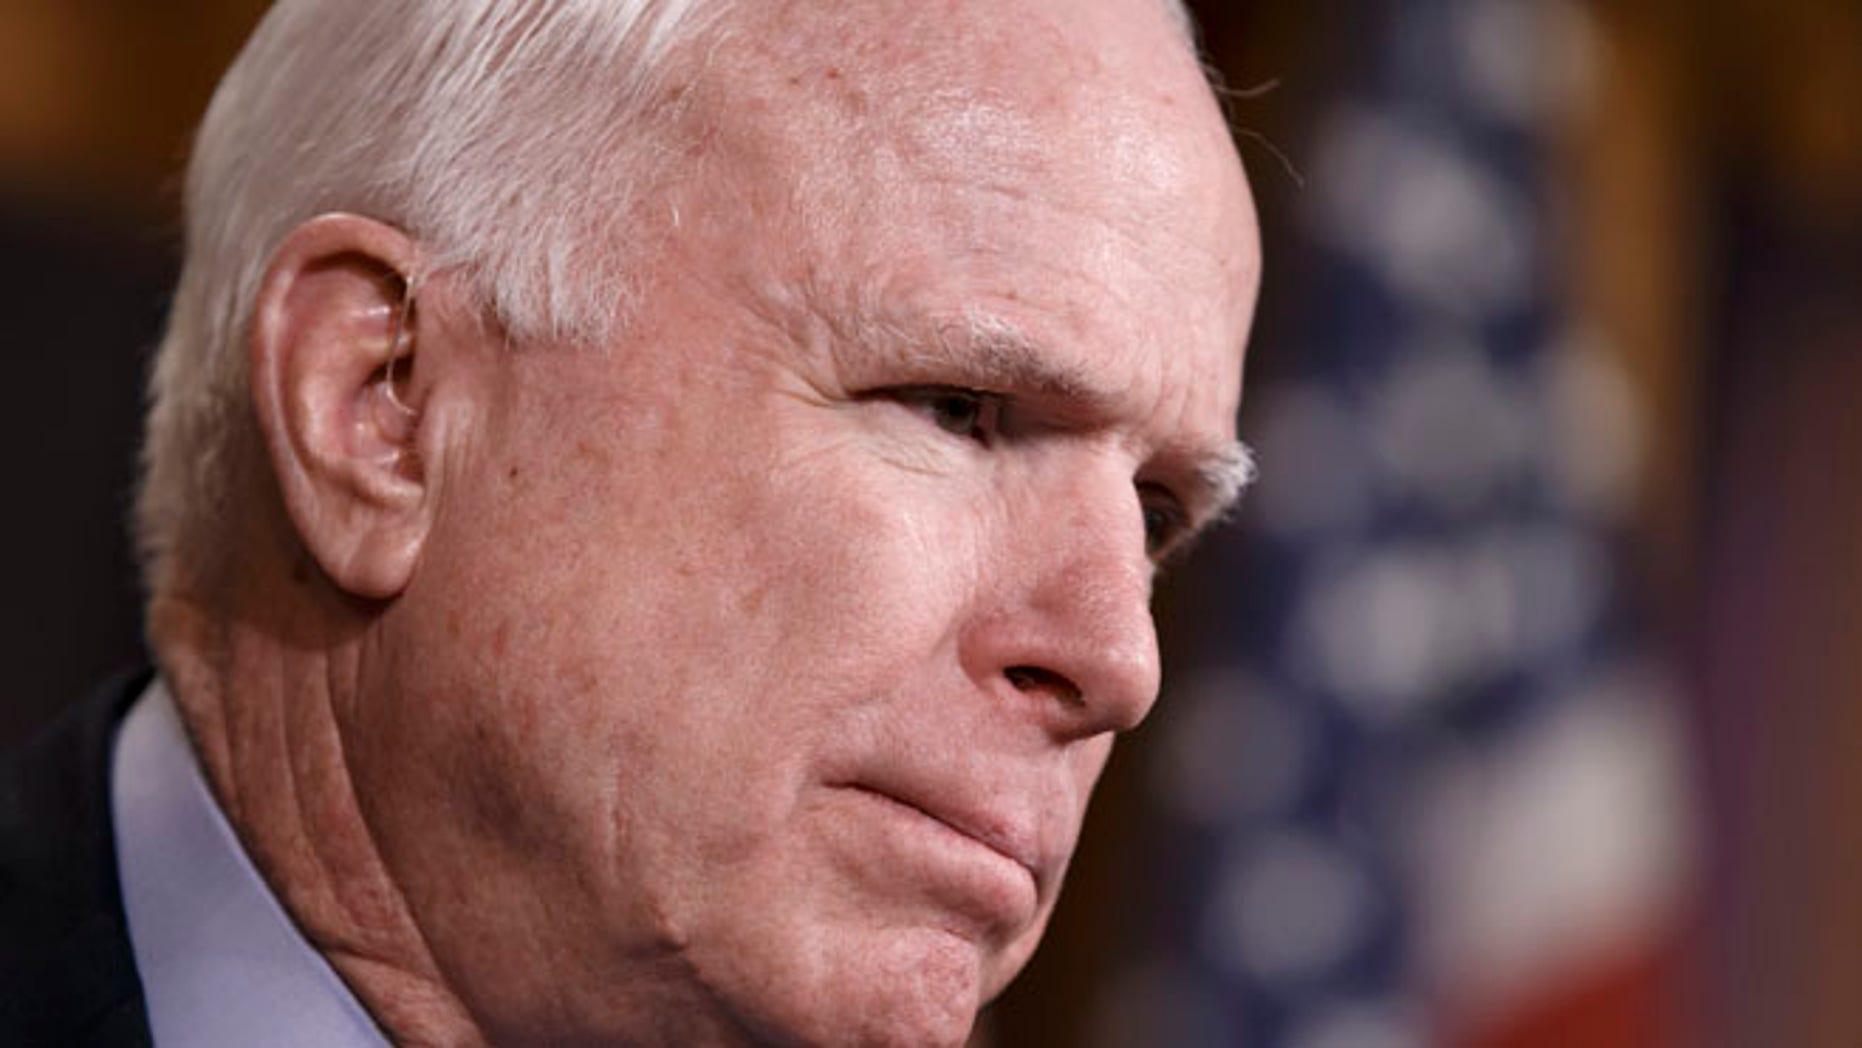 Feb. 5, 2015: Sen. John McCain, R-Ariz., speaks on Capitol Hill in Washington.